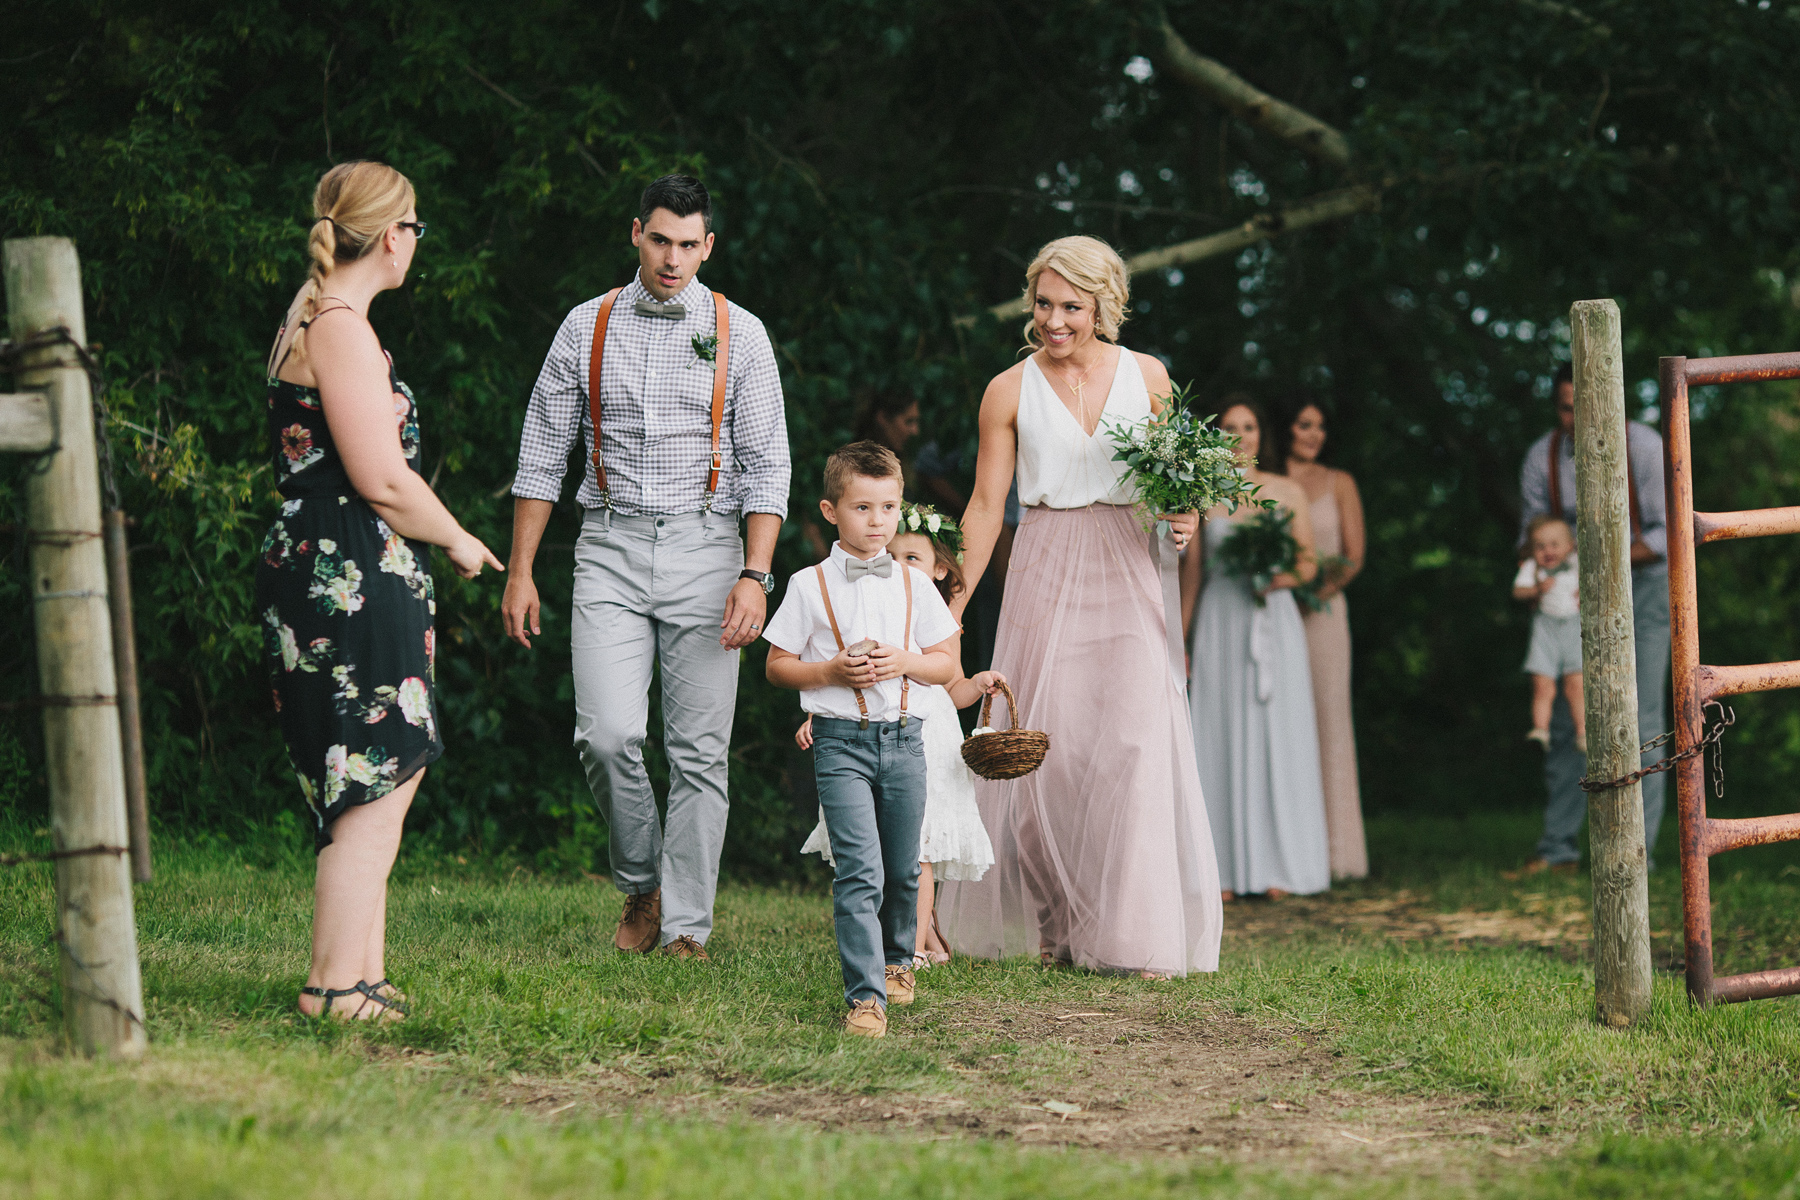 alberta-farm-wedding-photographer-rp-wj-096.jpg